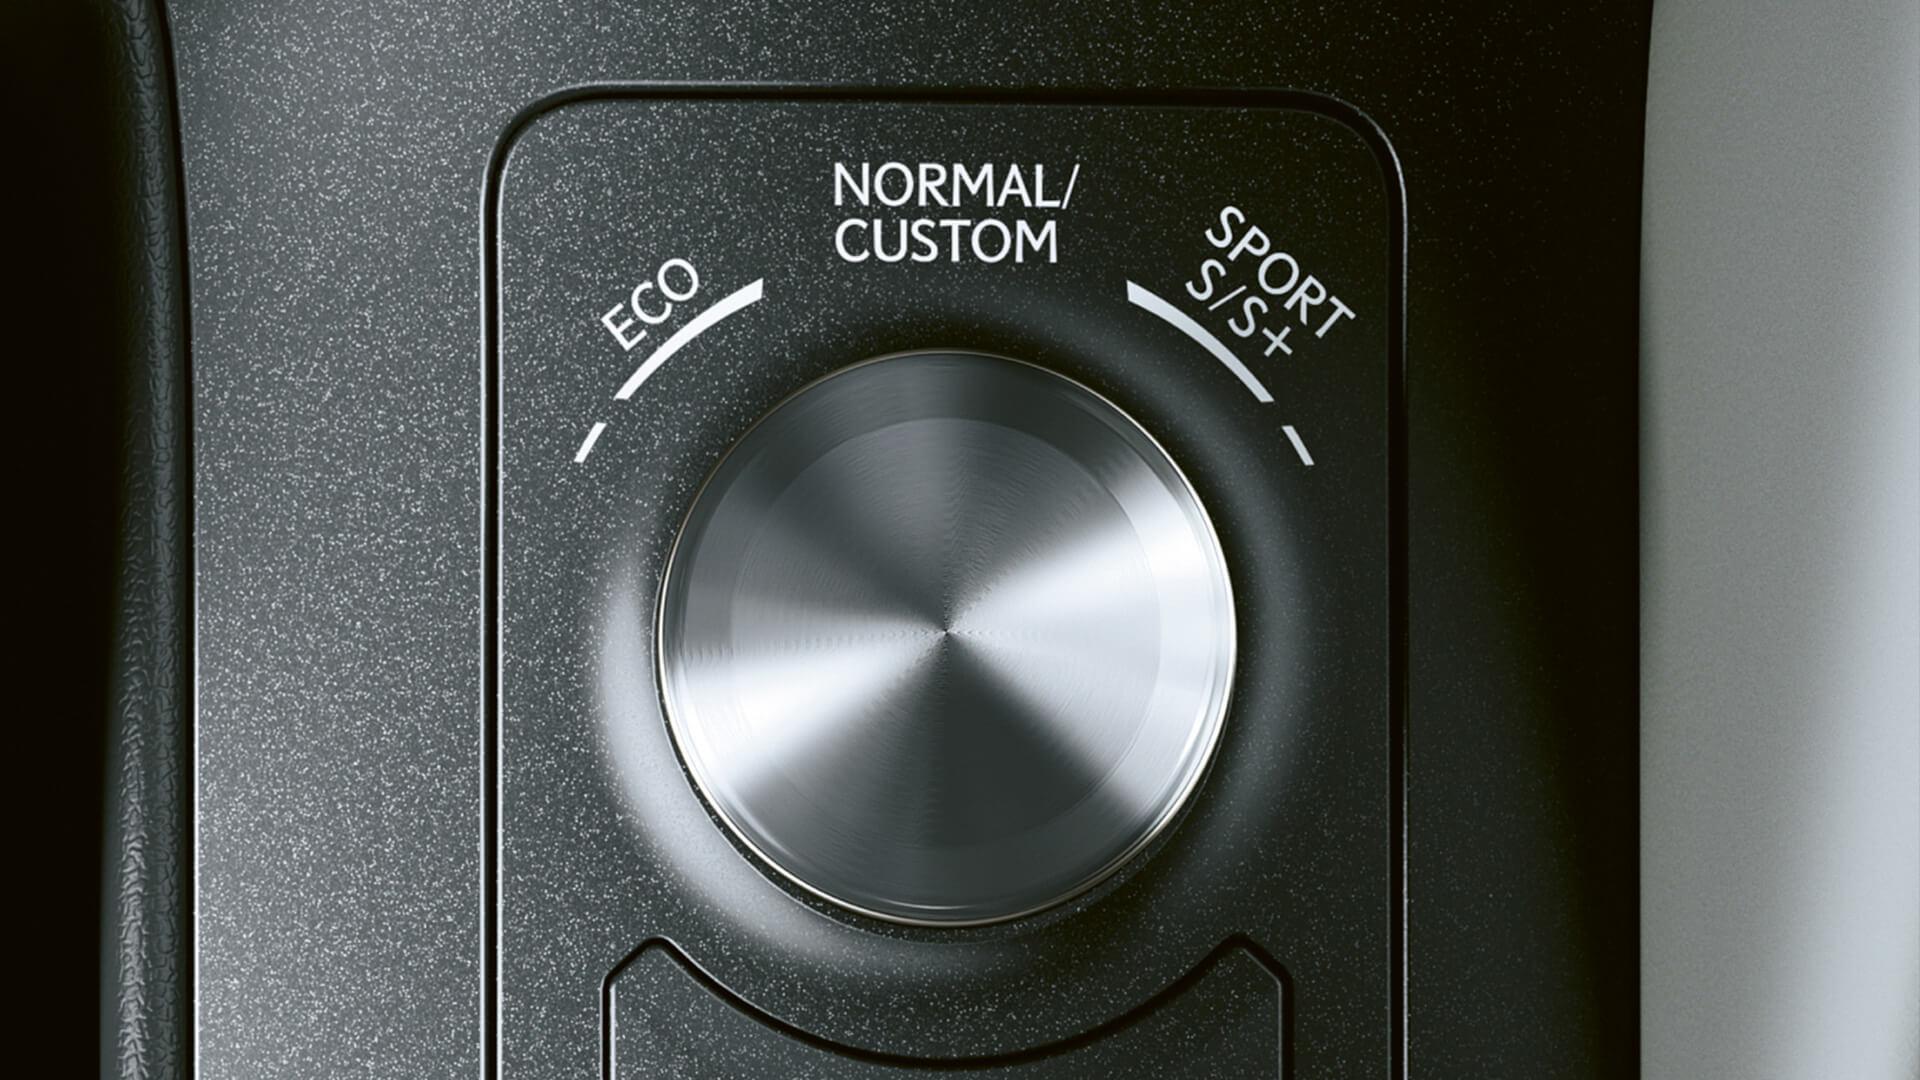 hotspot 1920x1080 drive mode select